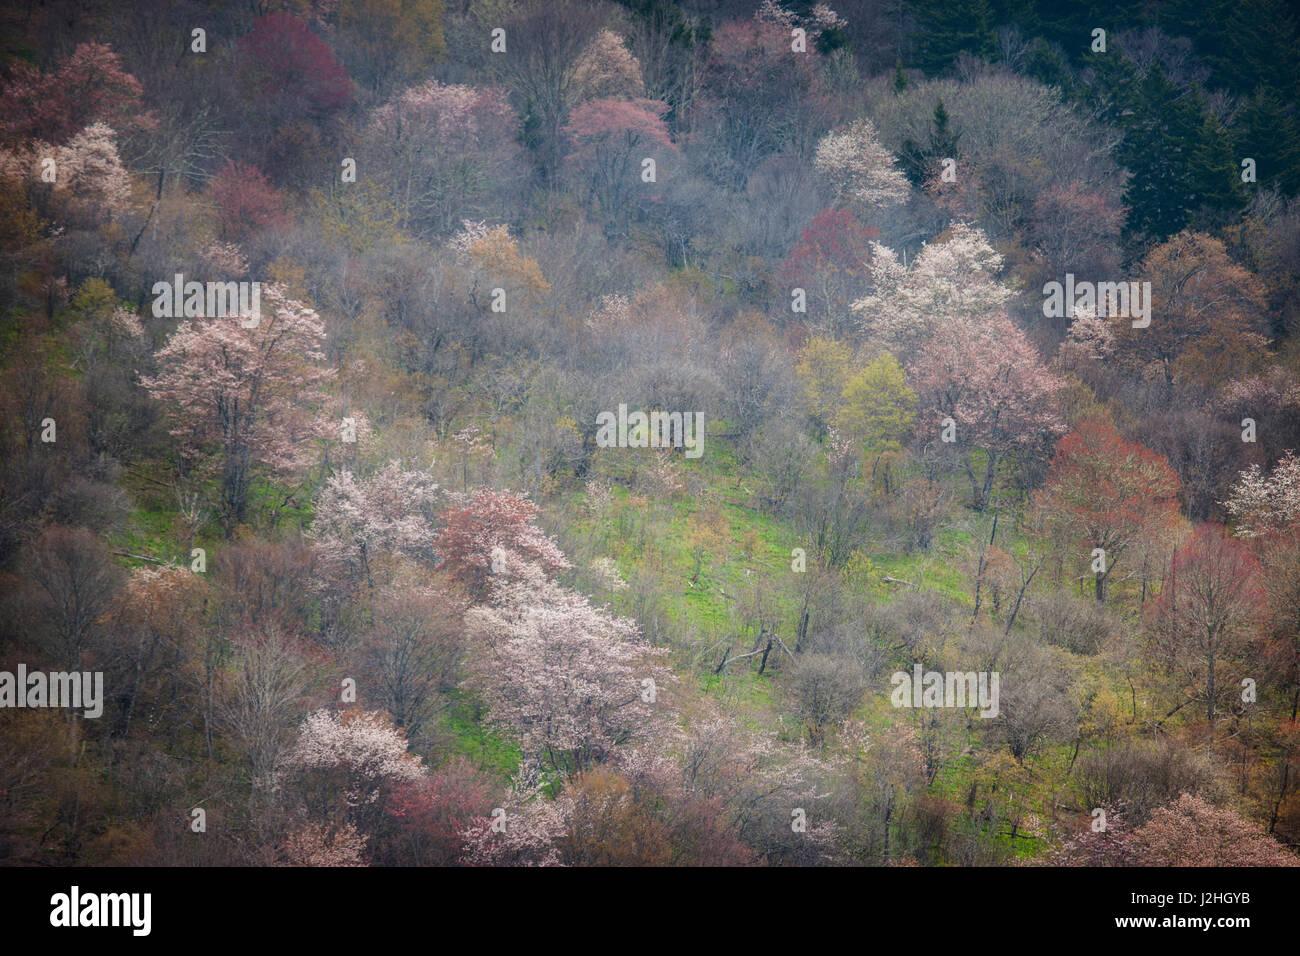 USA, North Carolina. Hardwood trees blooming in spring. Credit as: Don Grall / Jaynes Gallery / DanitaDelimont.com - Stock Image